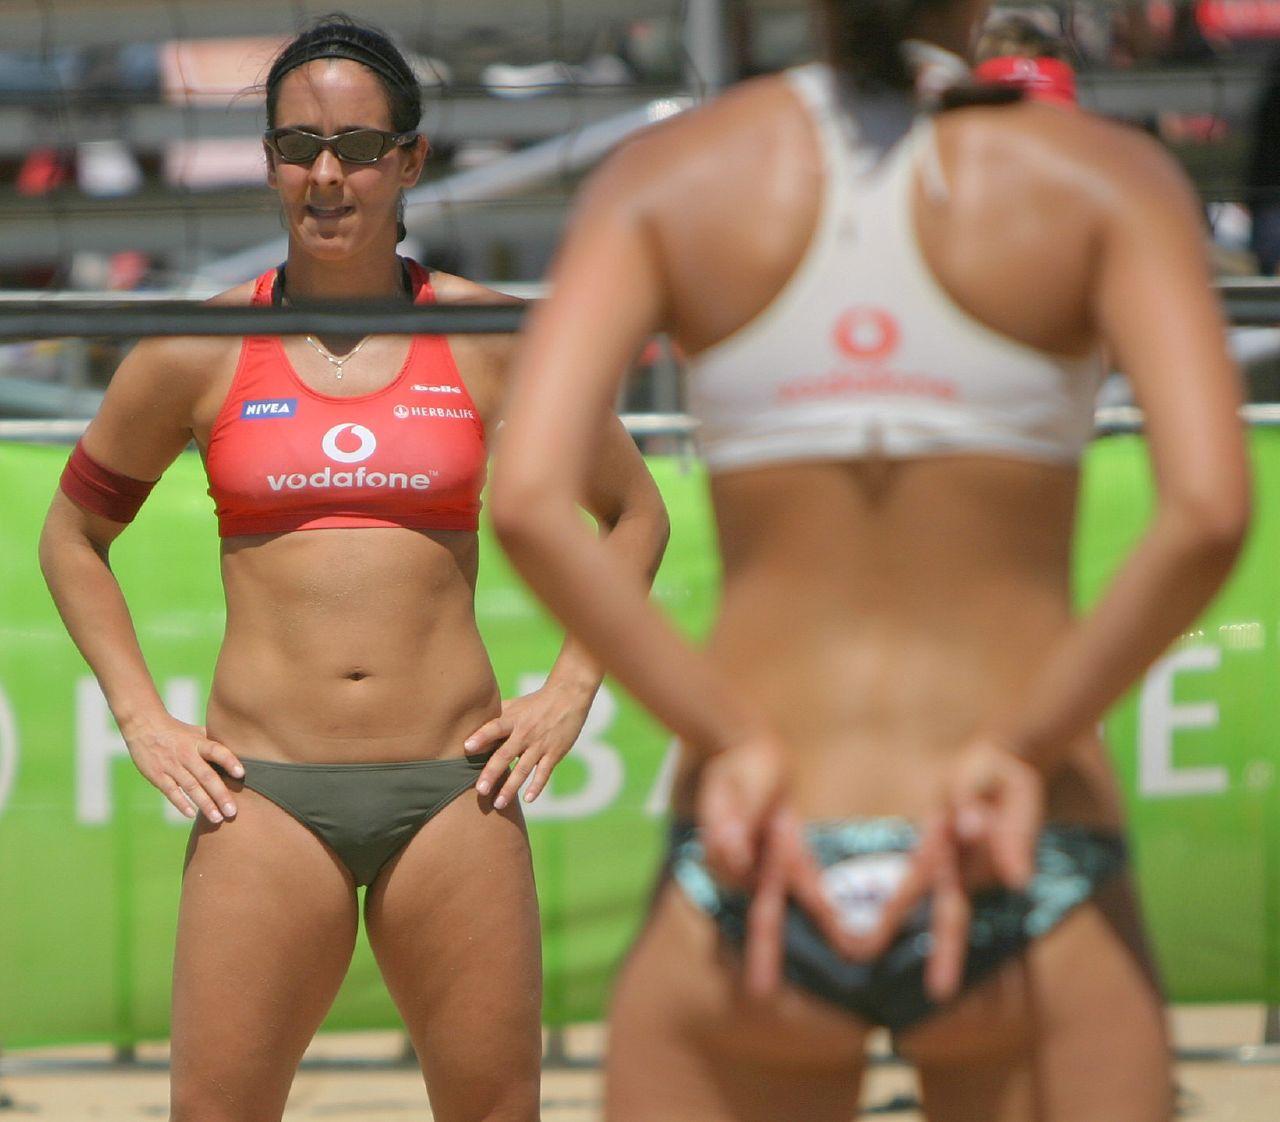 Women's beach volleyball on St Kilda beach in Australia